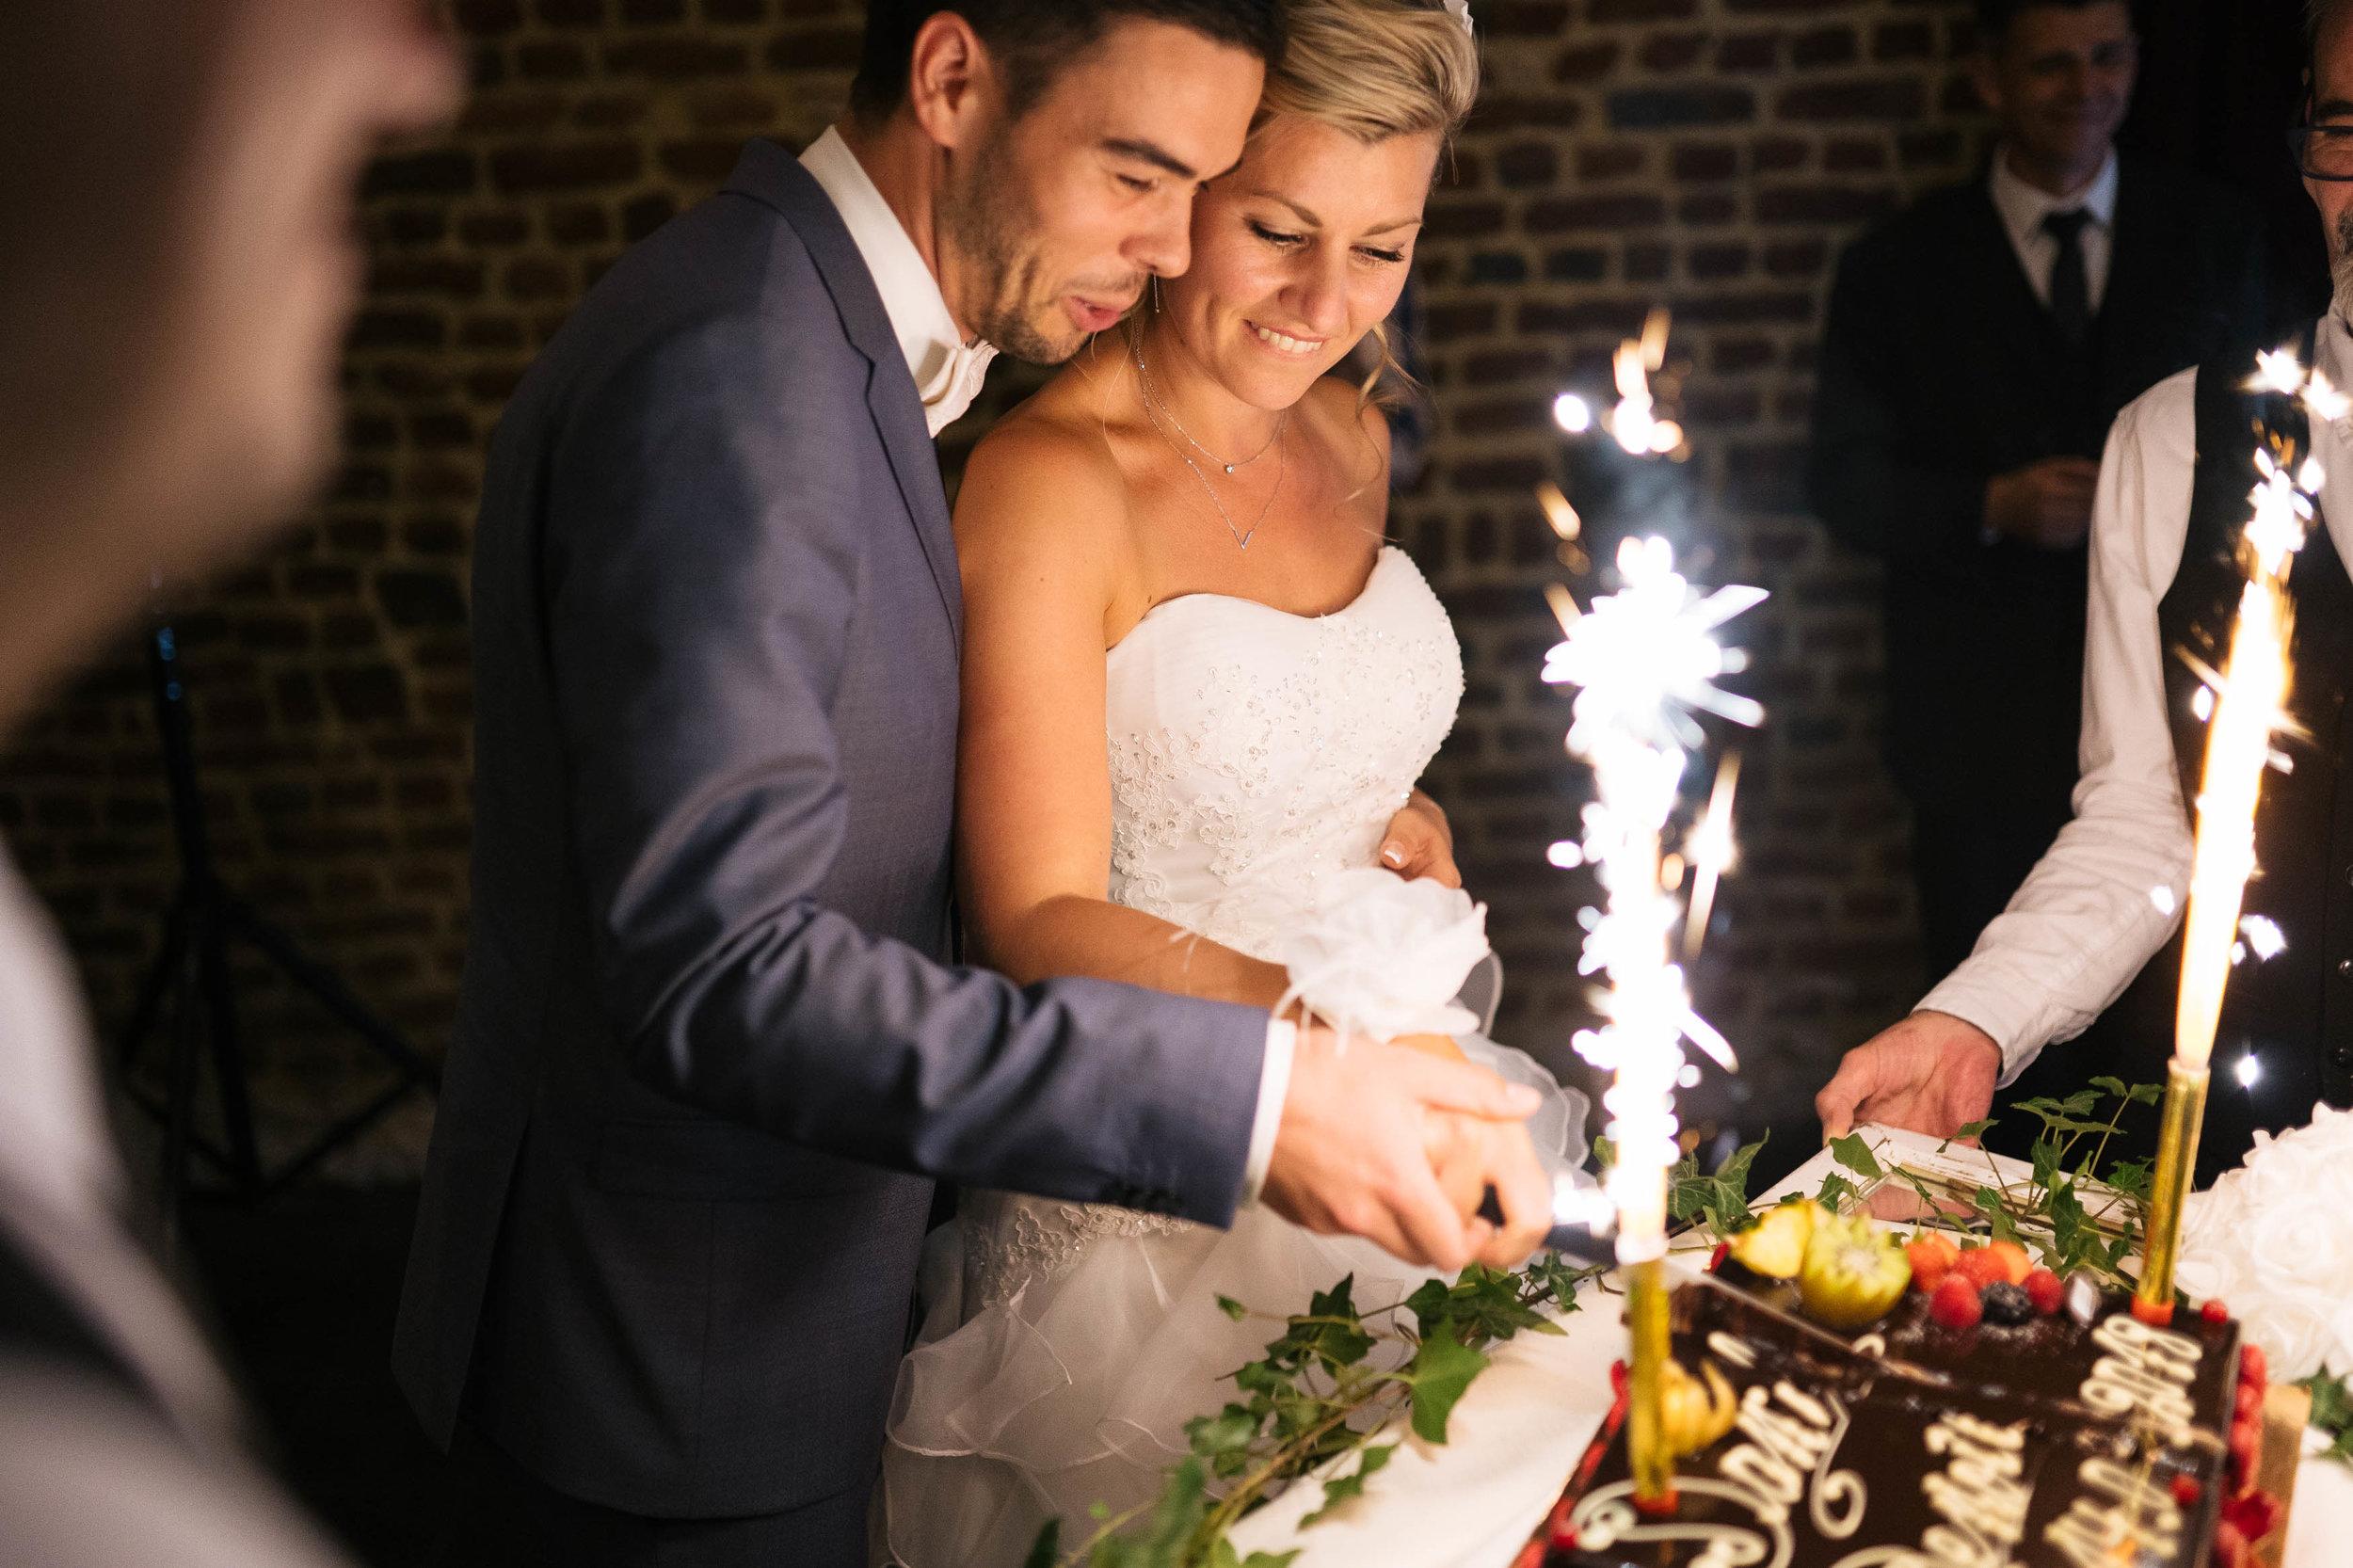 c-photographe-videaste-mariage-bruxelles-leleu-78.jpg